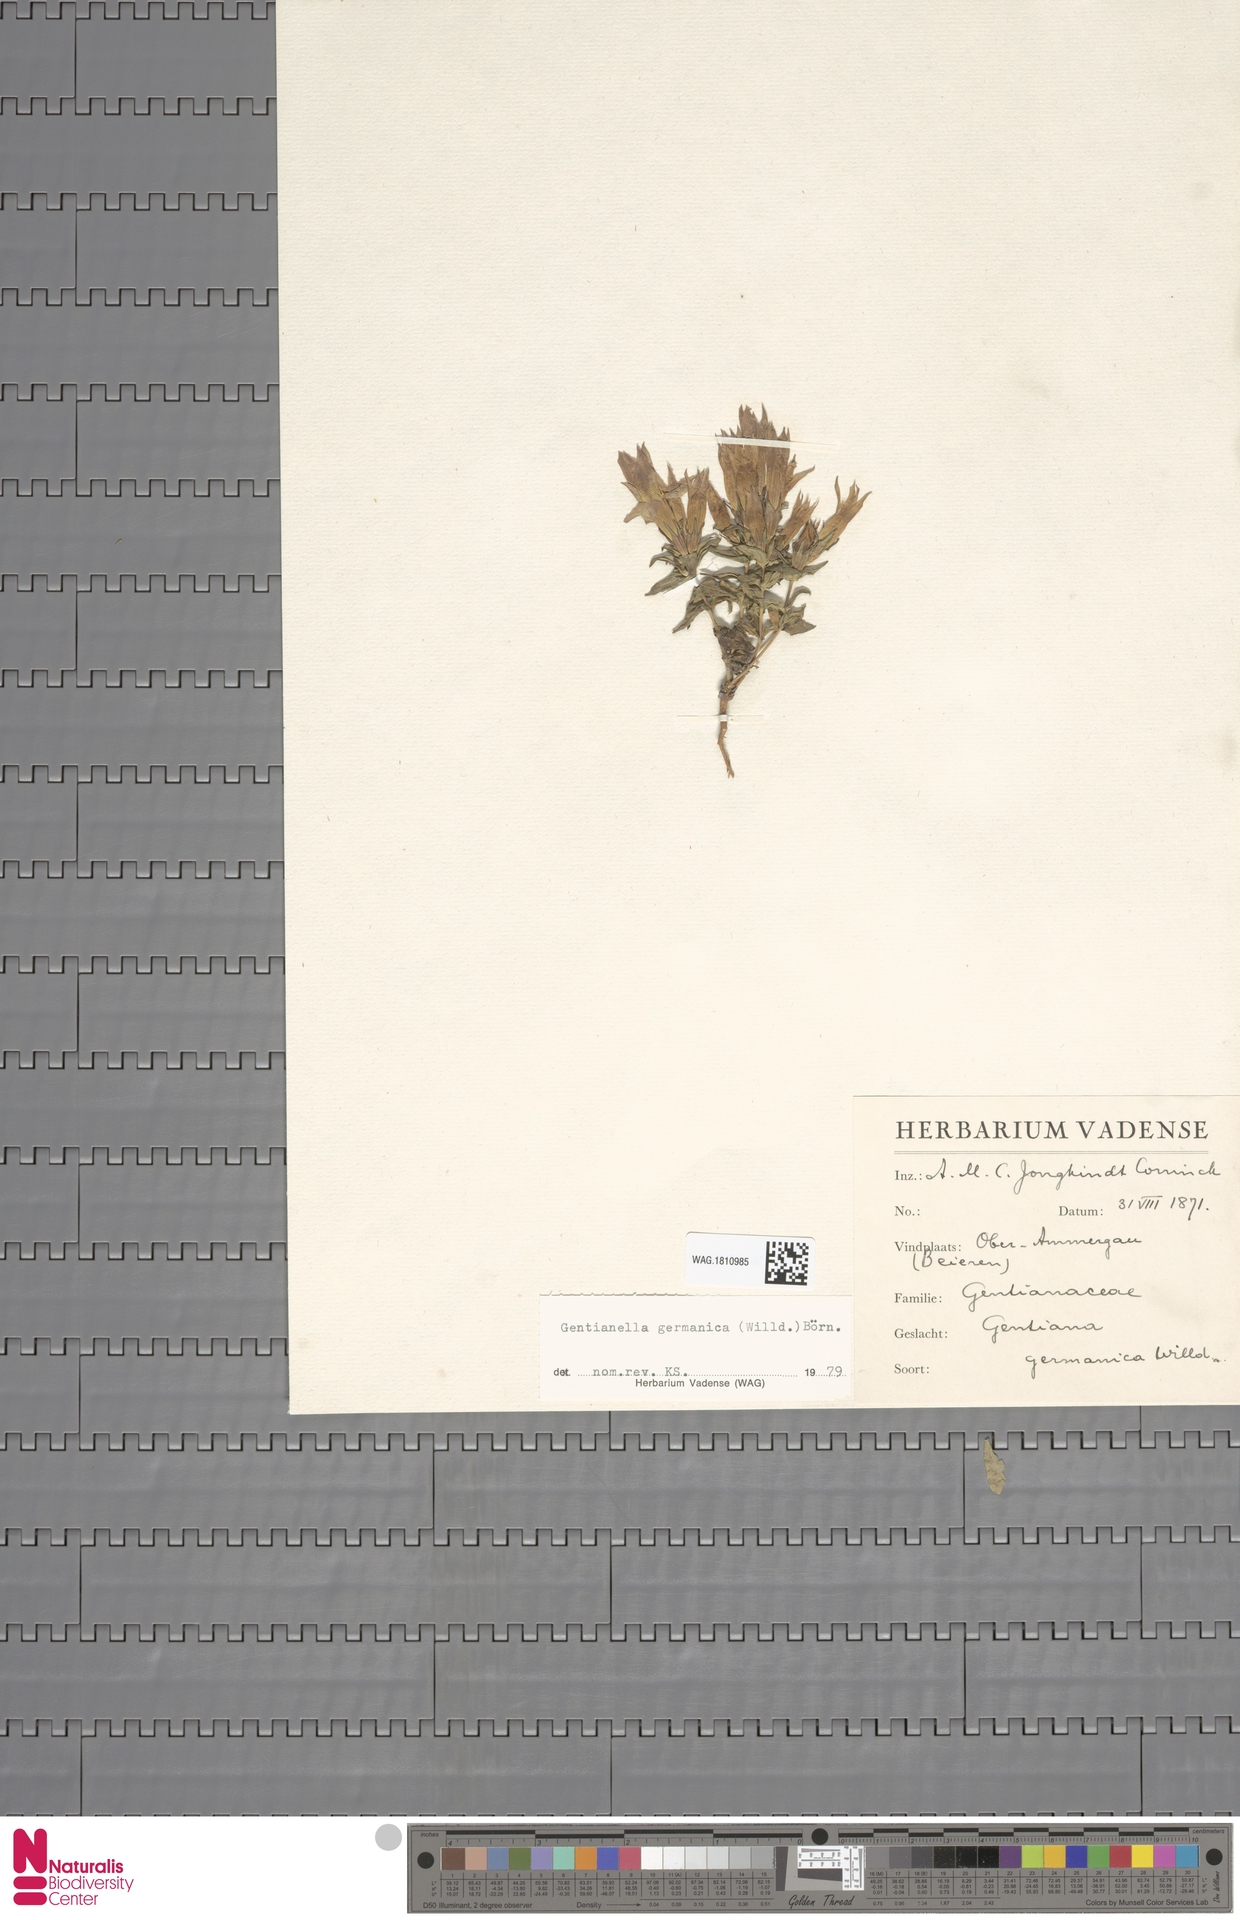 WAG.1810985 | Gentianella germanica (Willd.) E.F.Warb.